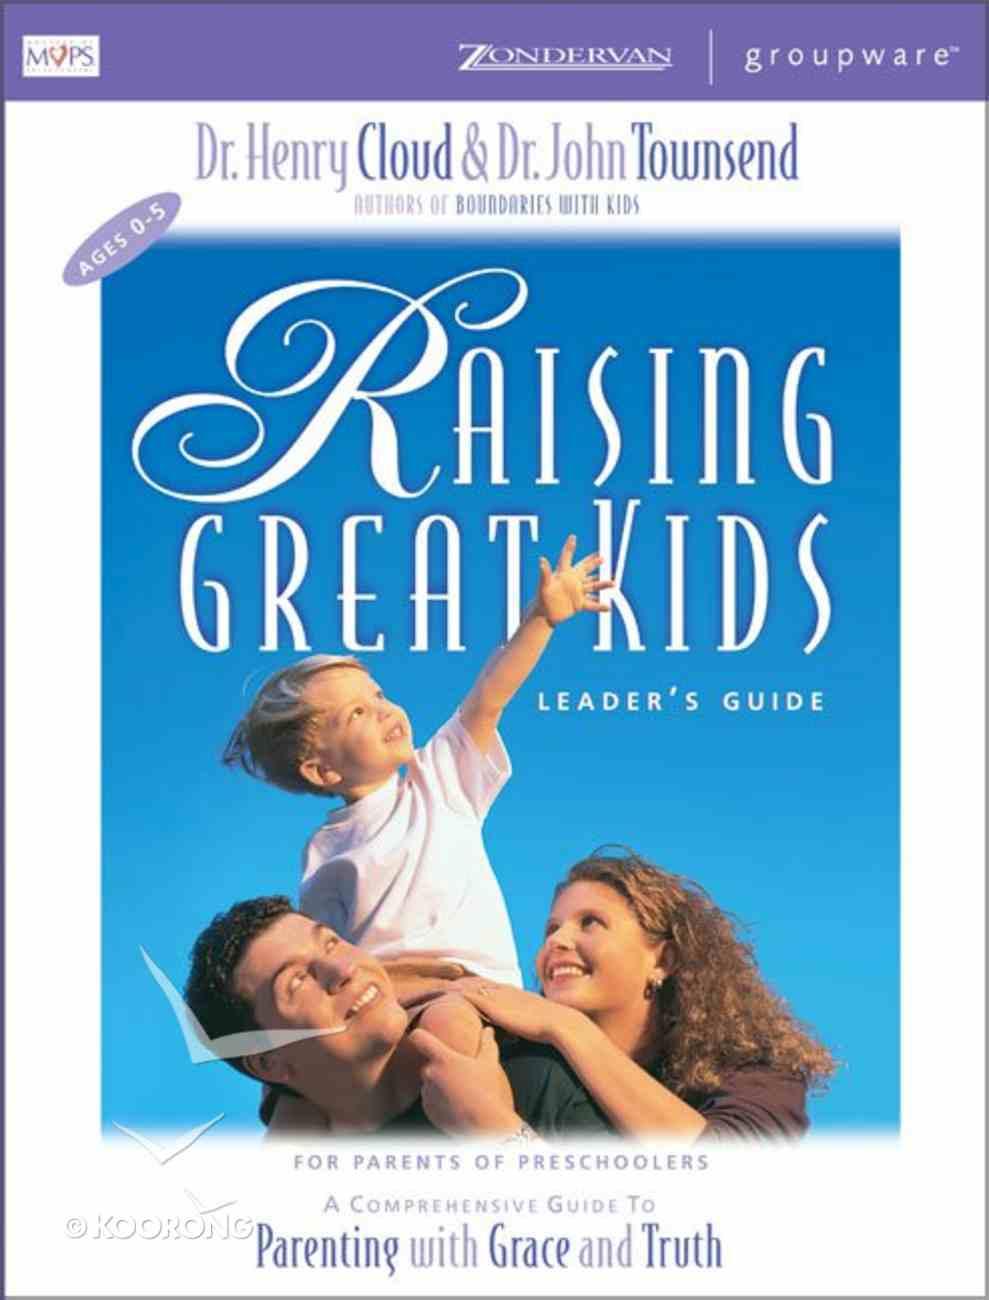 Raising Great Kids (Leader's Guide) Paperback